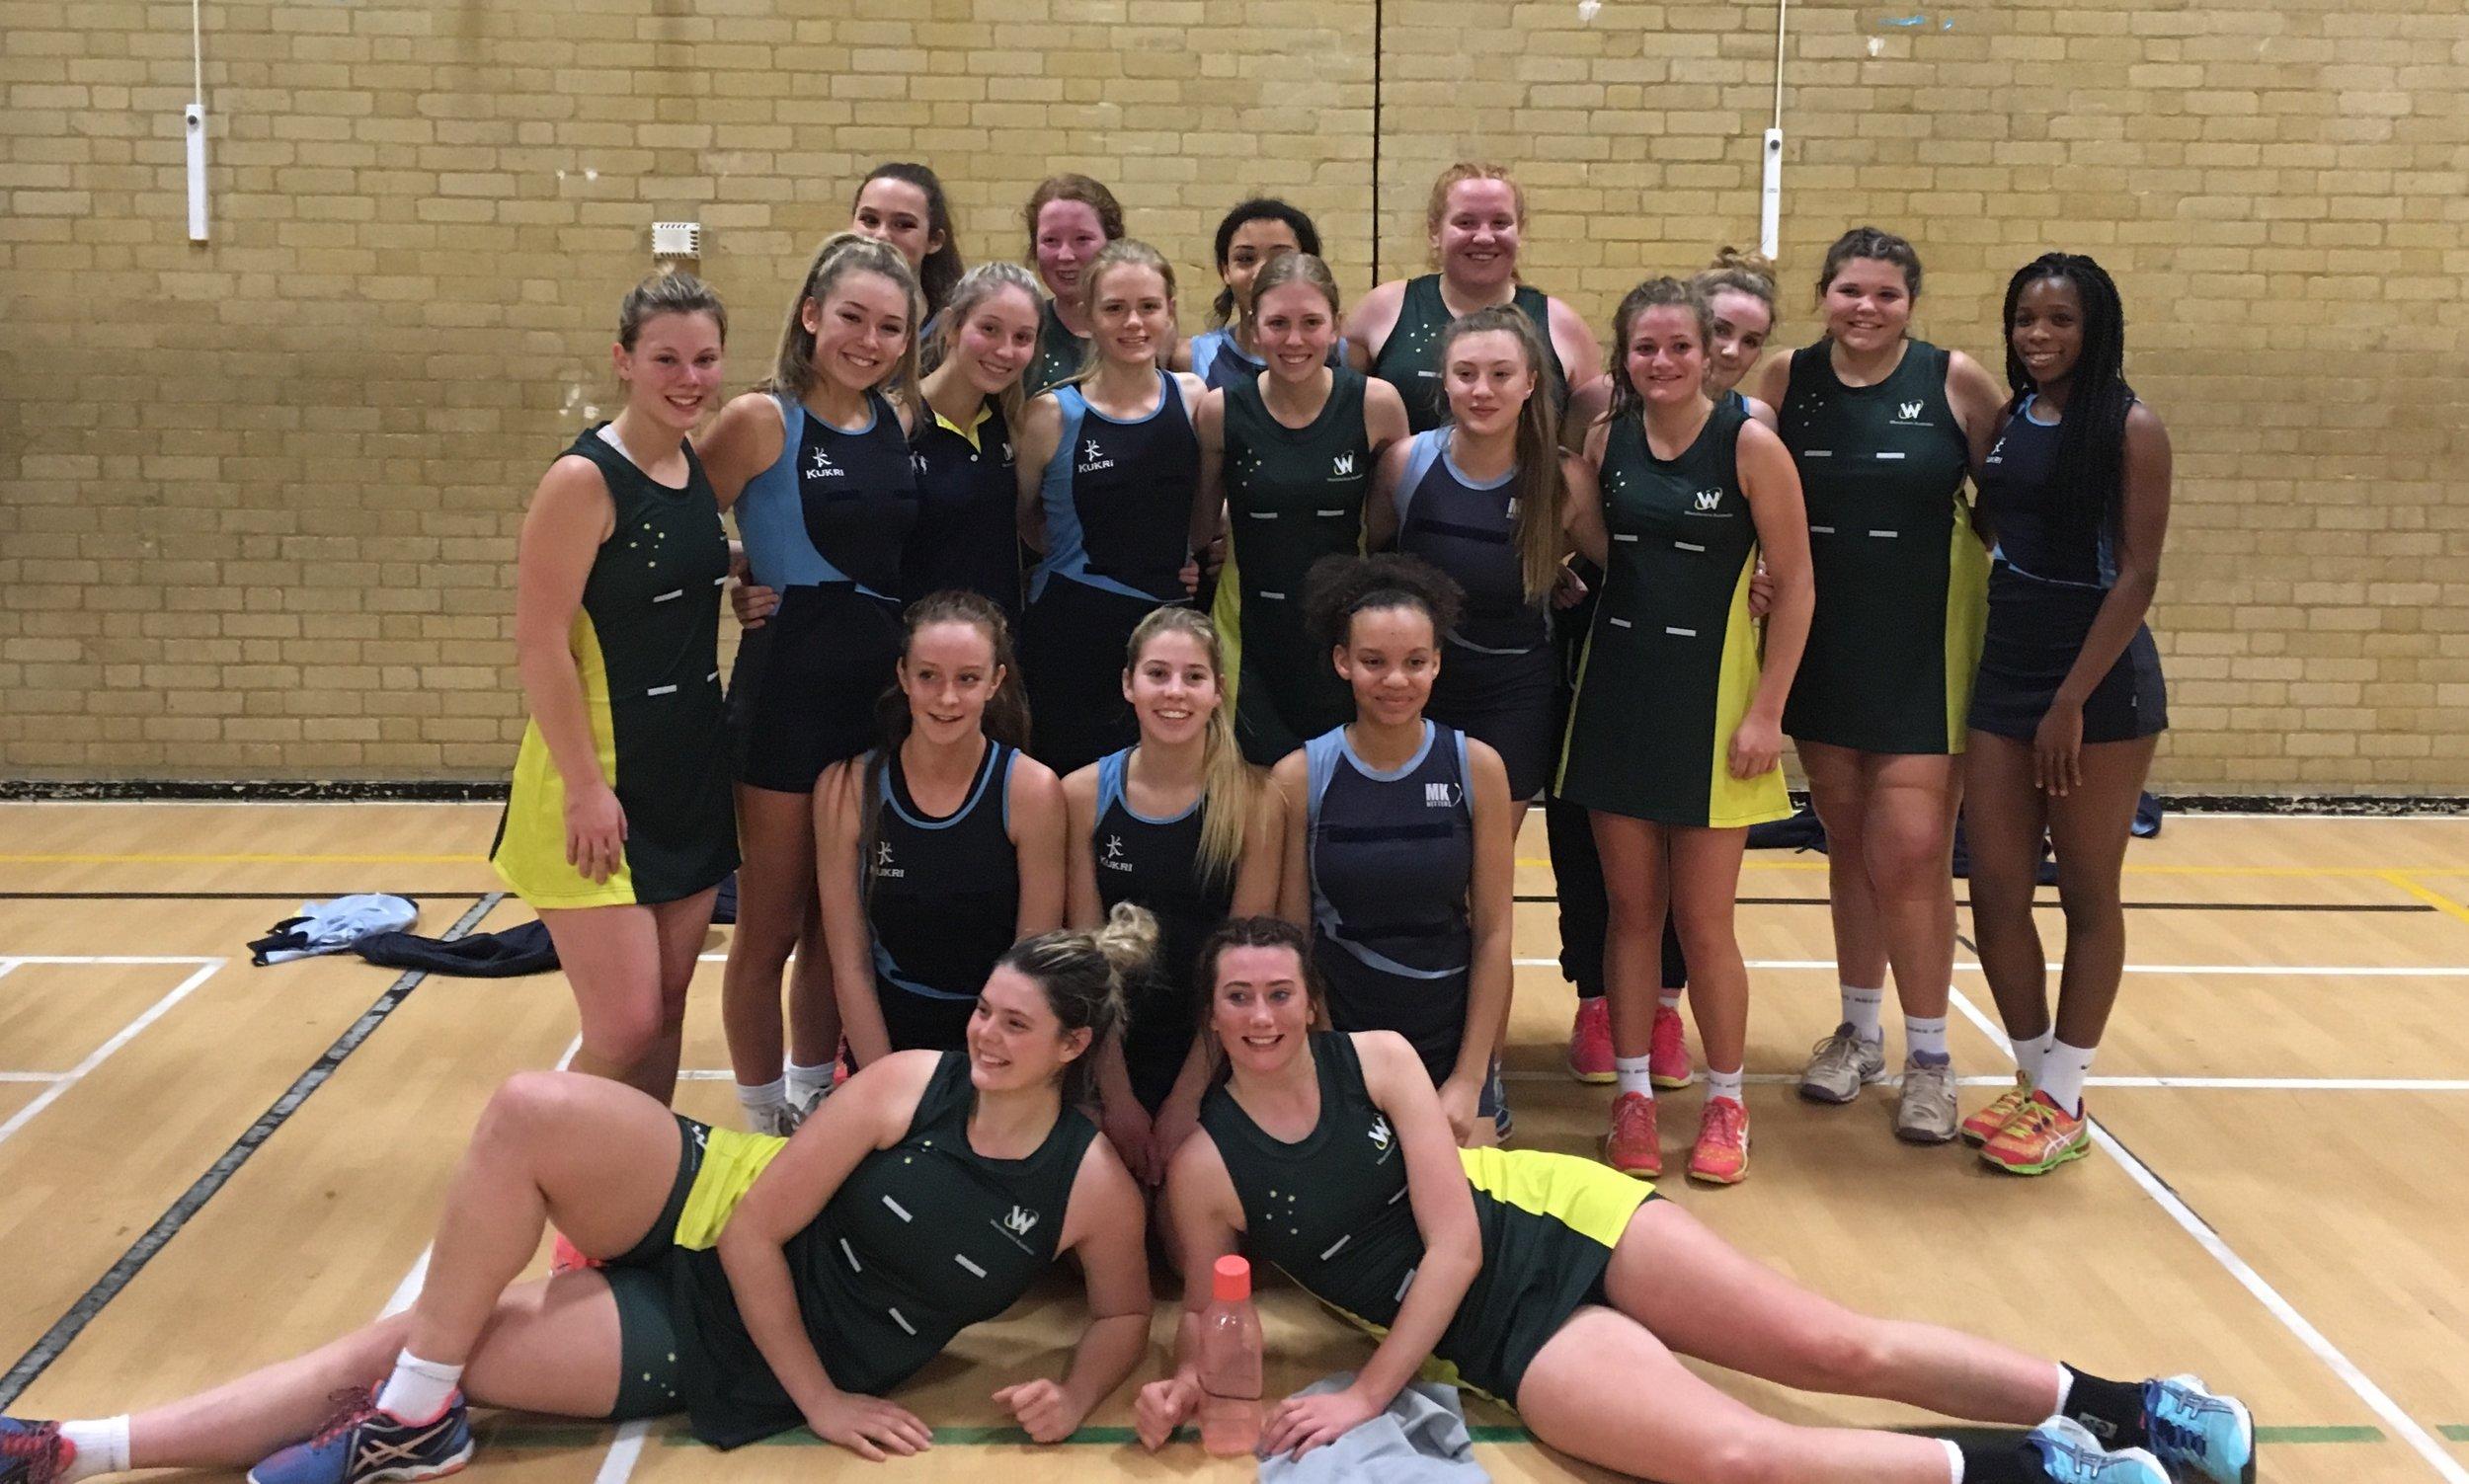 18&U girls with Milton Keynes Netters NC